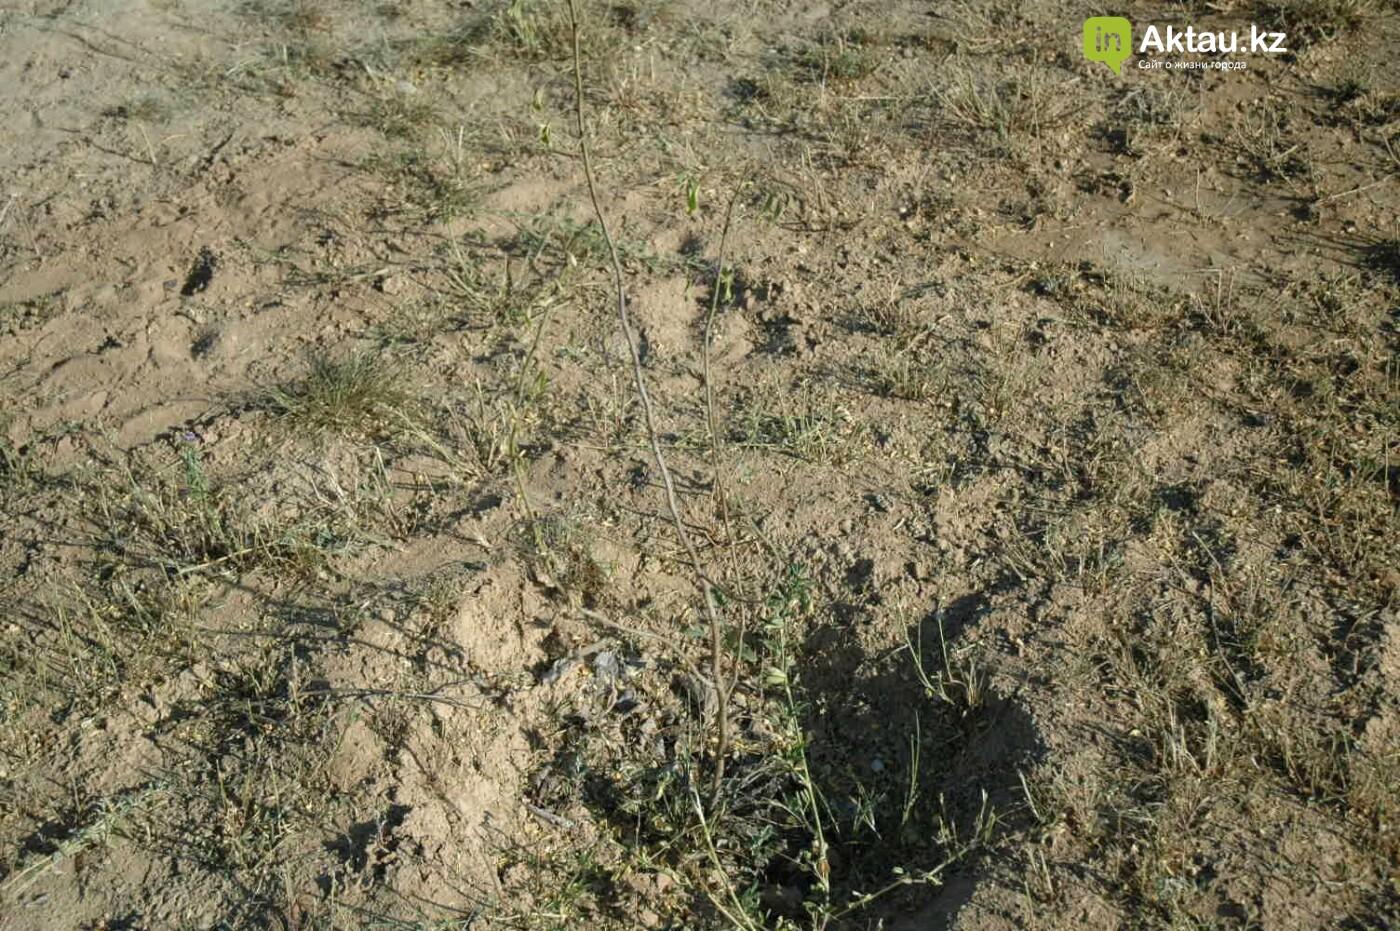 Погибшие от засухи и обезвоживания в Актау исчисляются десятками (ФОТО), фото-7